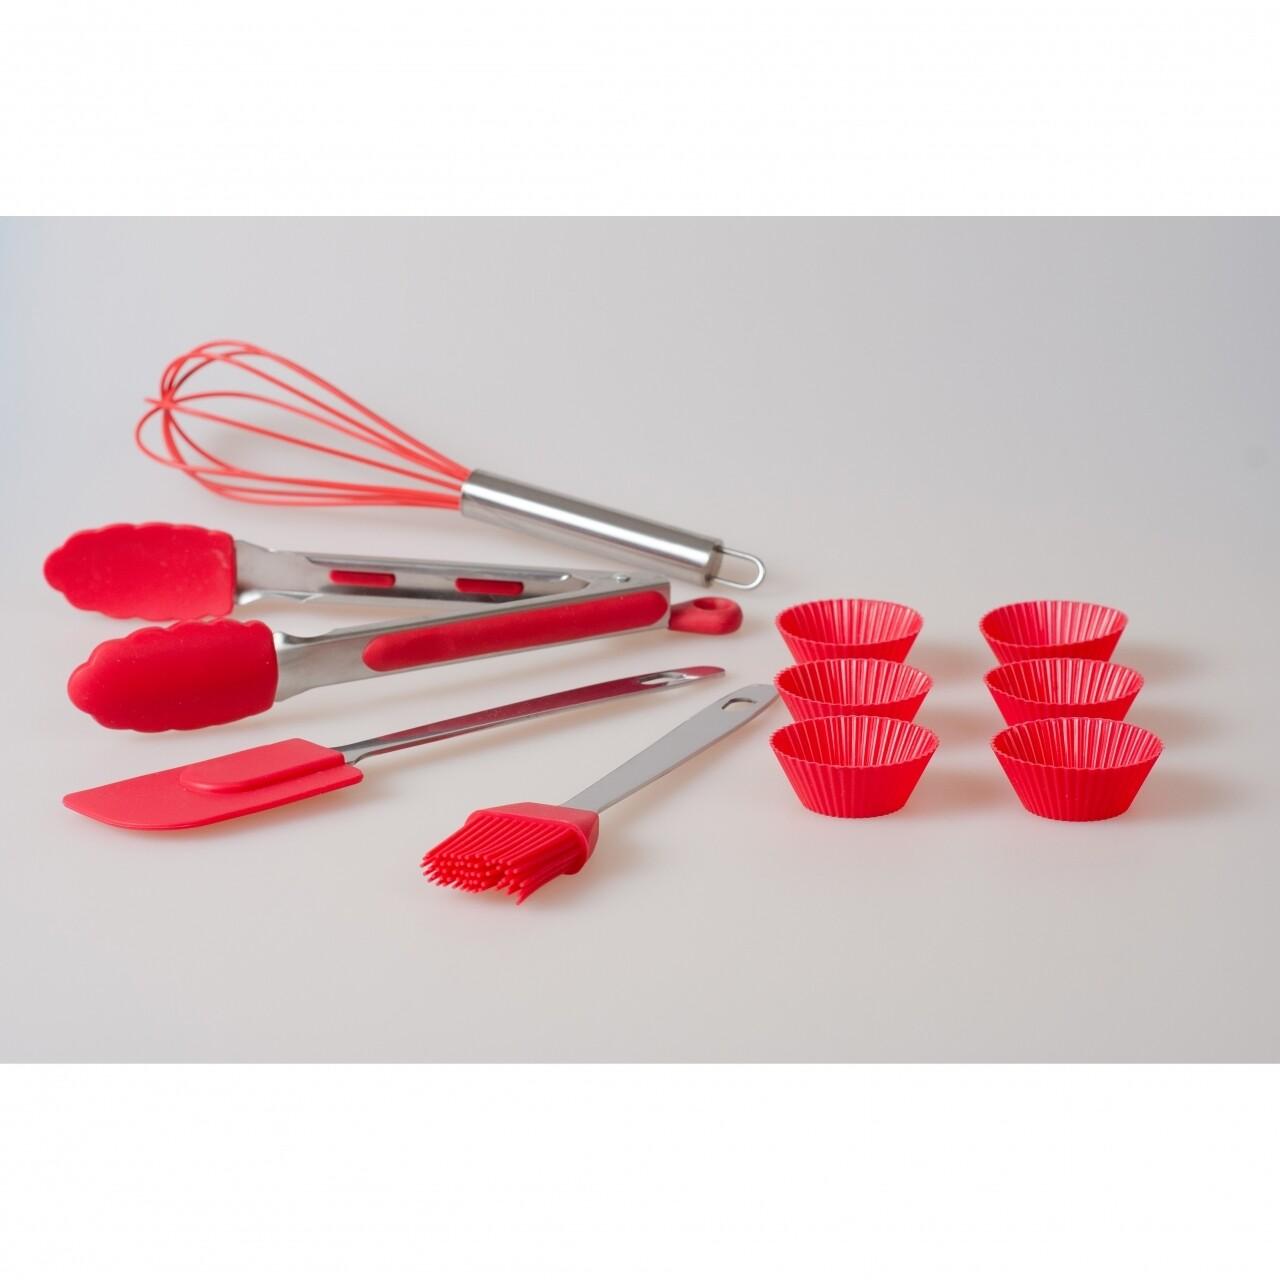 Set 10 ustensile pentru bucatarie, Jocca, silicon/otel inoxidabil, rosu